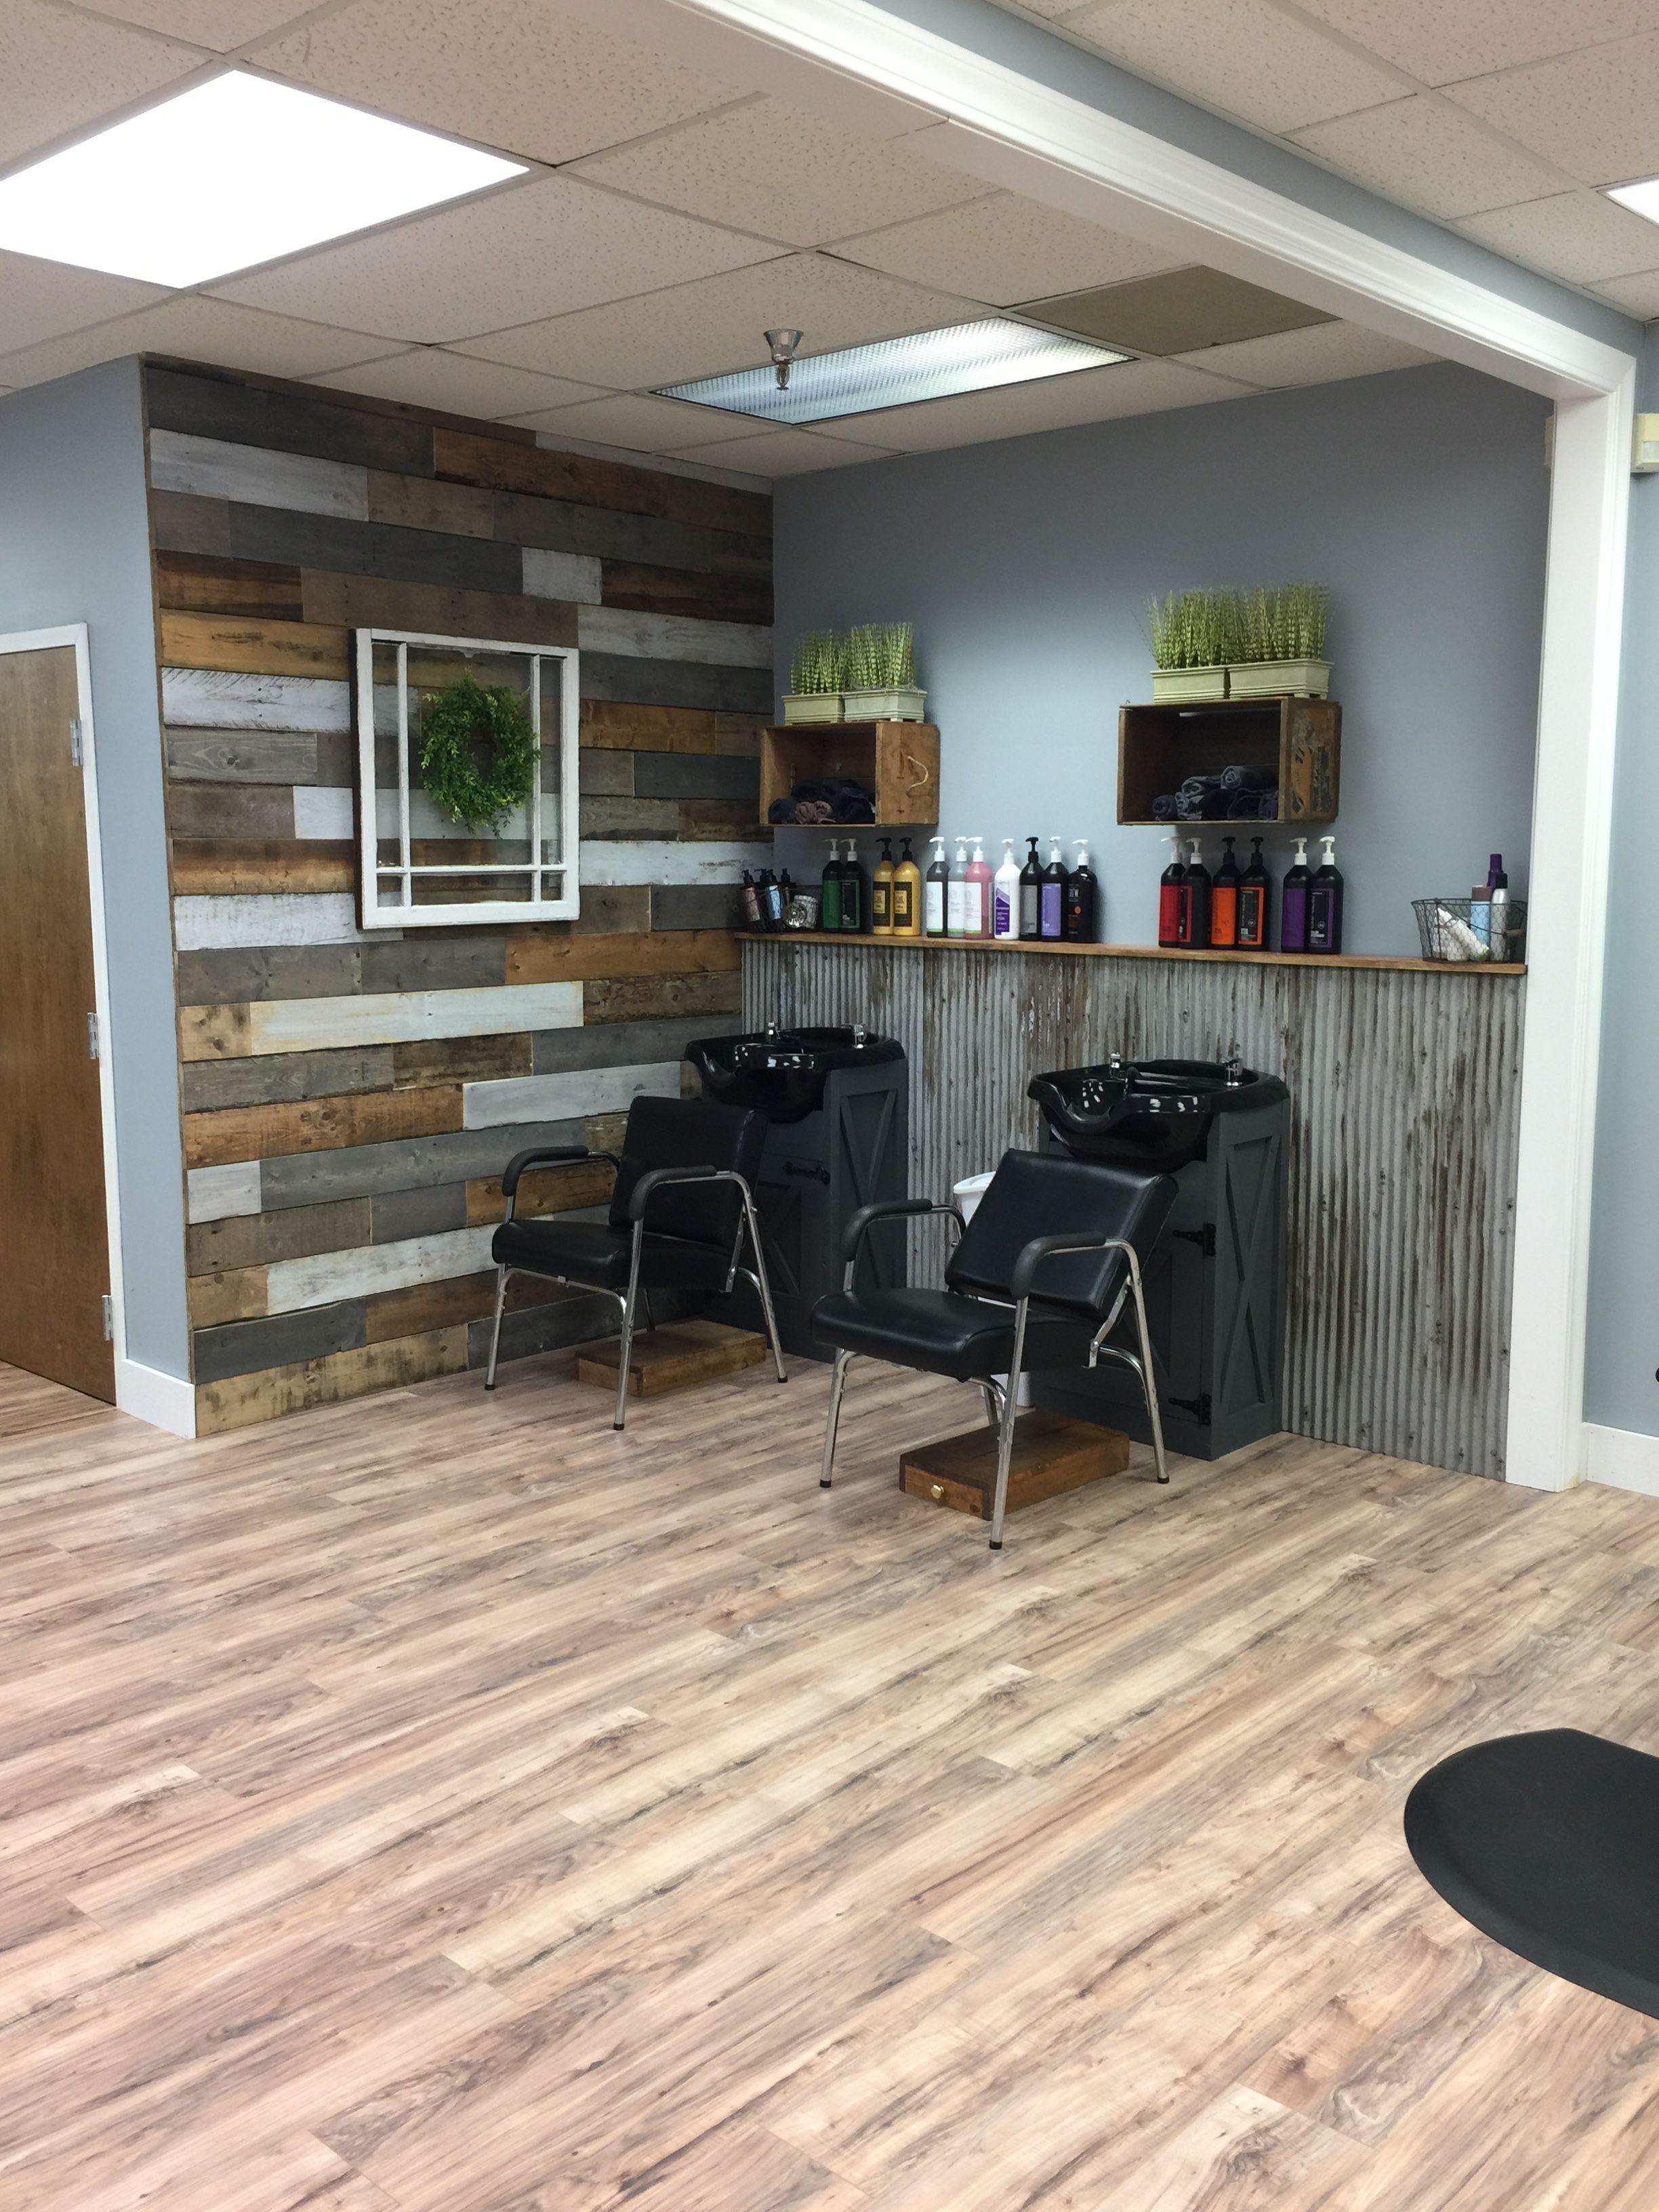 Pin By Tammylynn Vance On My Farmhouse Chic Hair Salon Spa Hair Salon Decor Hair Salon Interior Rustic Salon